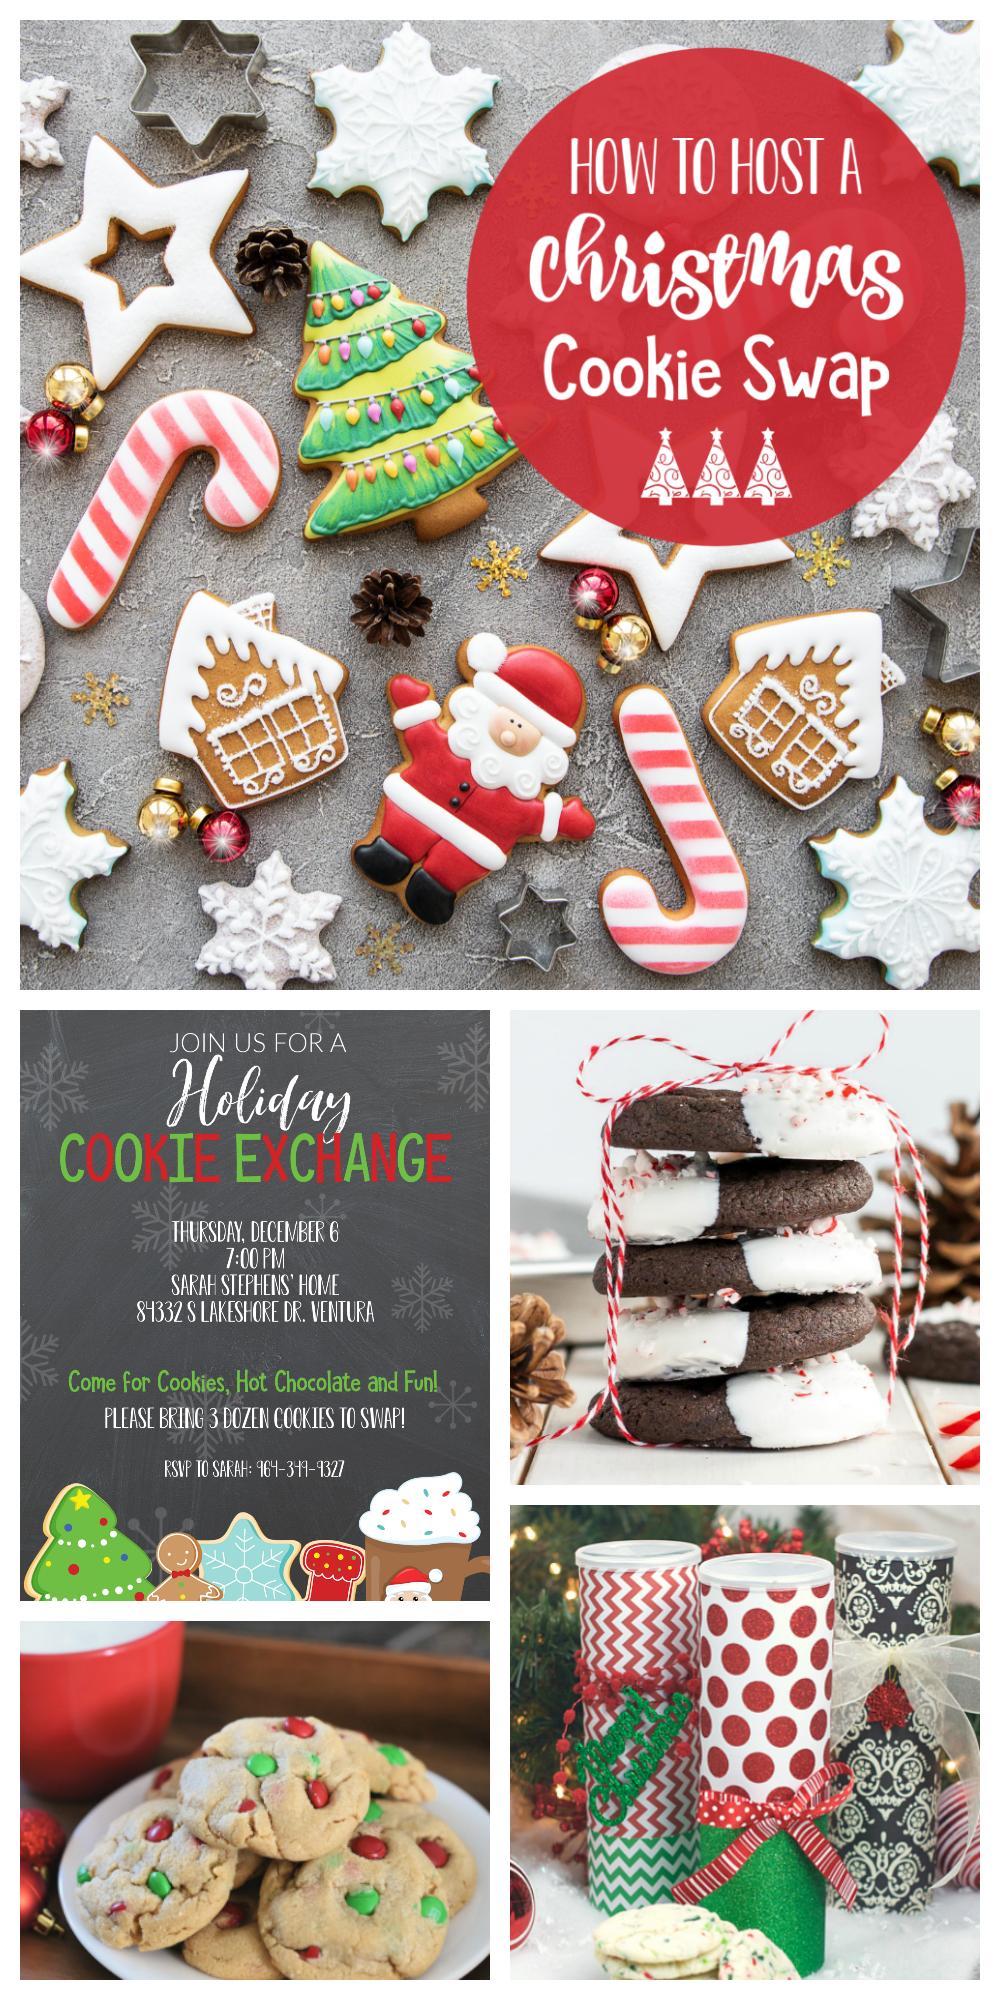 Christmas Cookie Exchange Christmas Cookie Swap Party Christmas Cookie Exchange Party Ideas Cookie Exchange Invitations